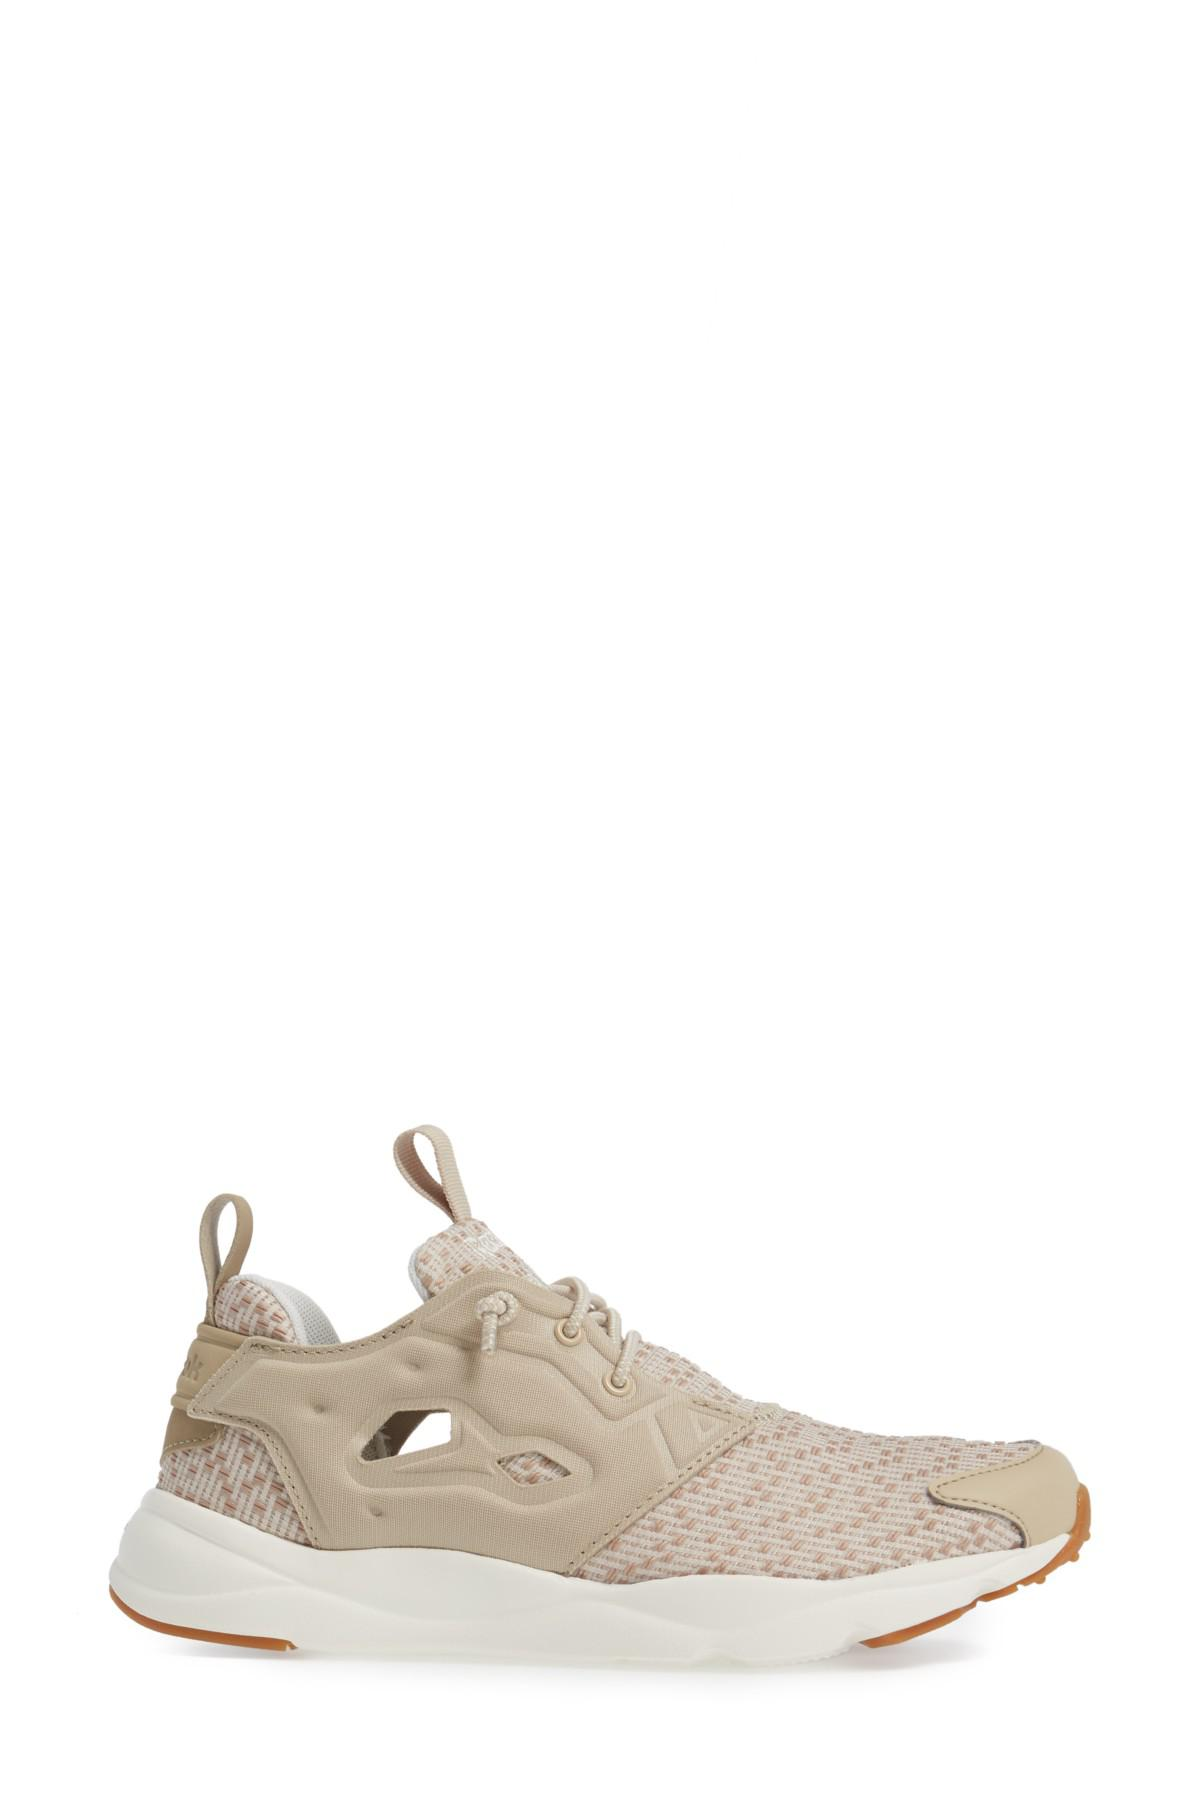 0f298cfa4a9 Reebok - Multicolor Furylite Off Tg Sneaker - Lyst